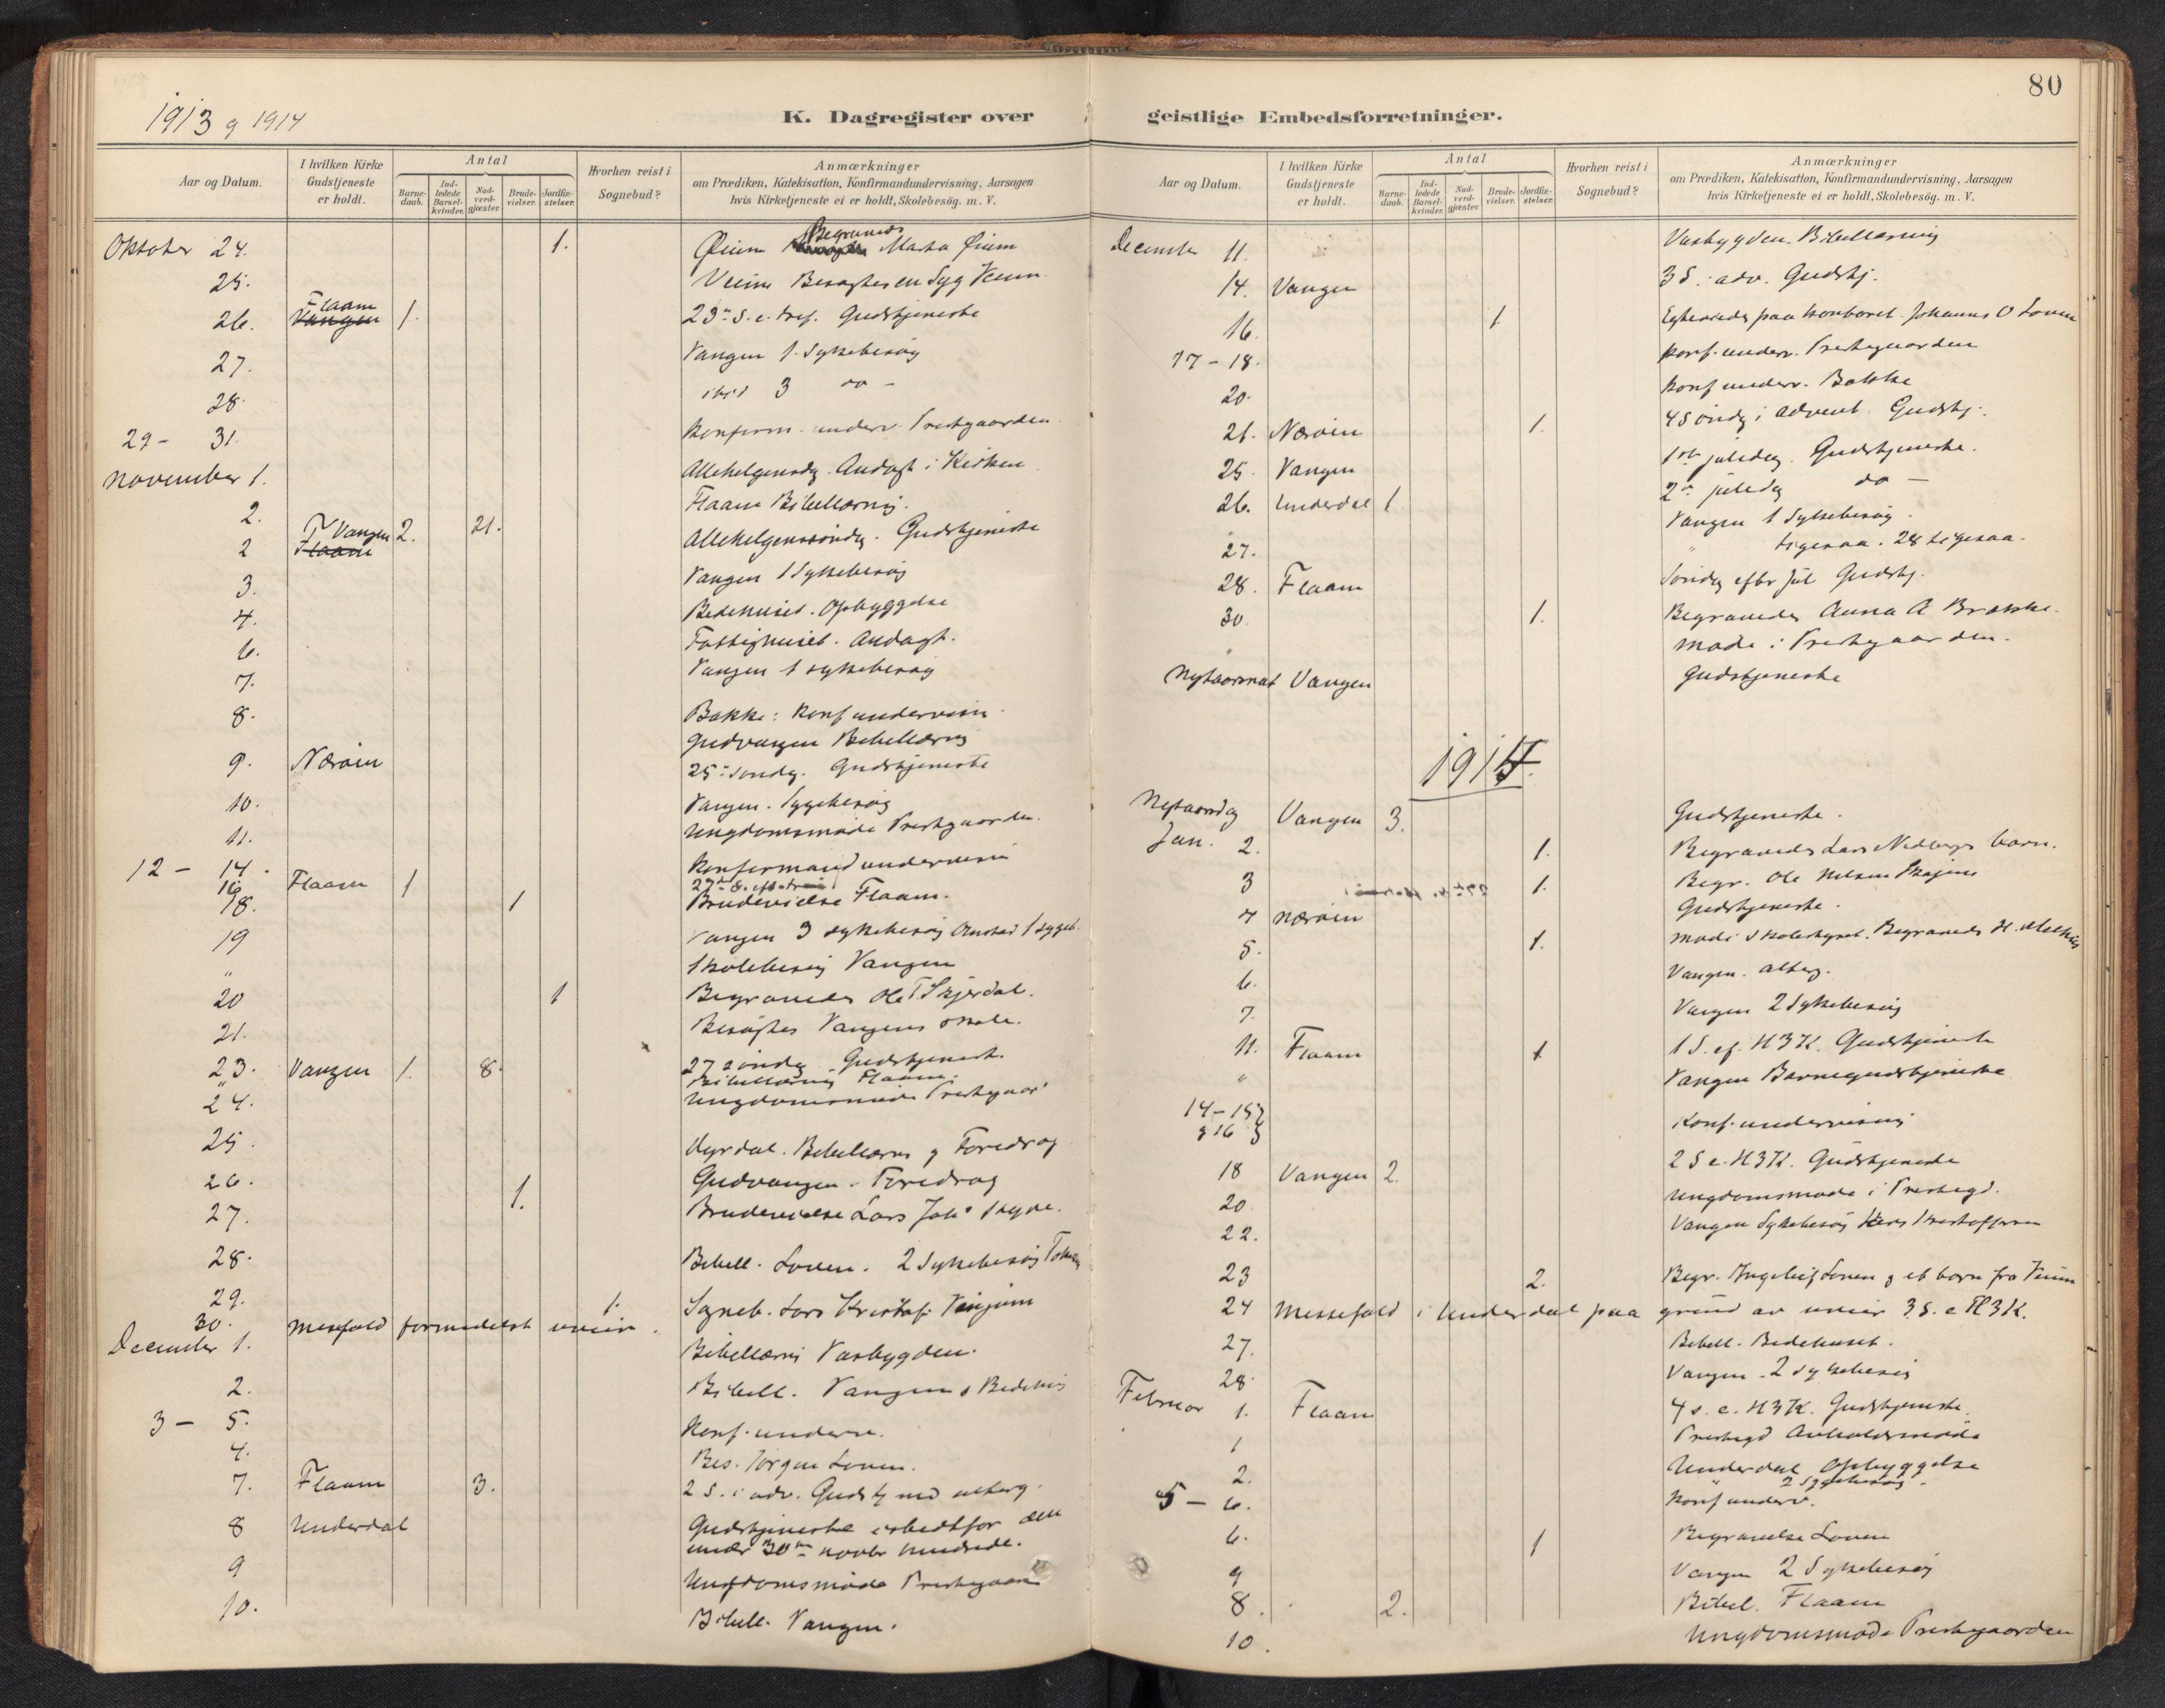 SAB, Aurland Sokneprestembete*, Dagregister nr. F 2, 1891-1932, s. 79b-80a